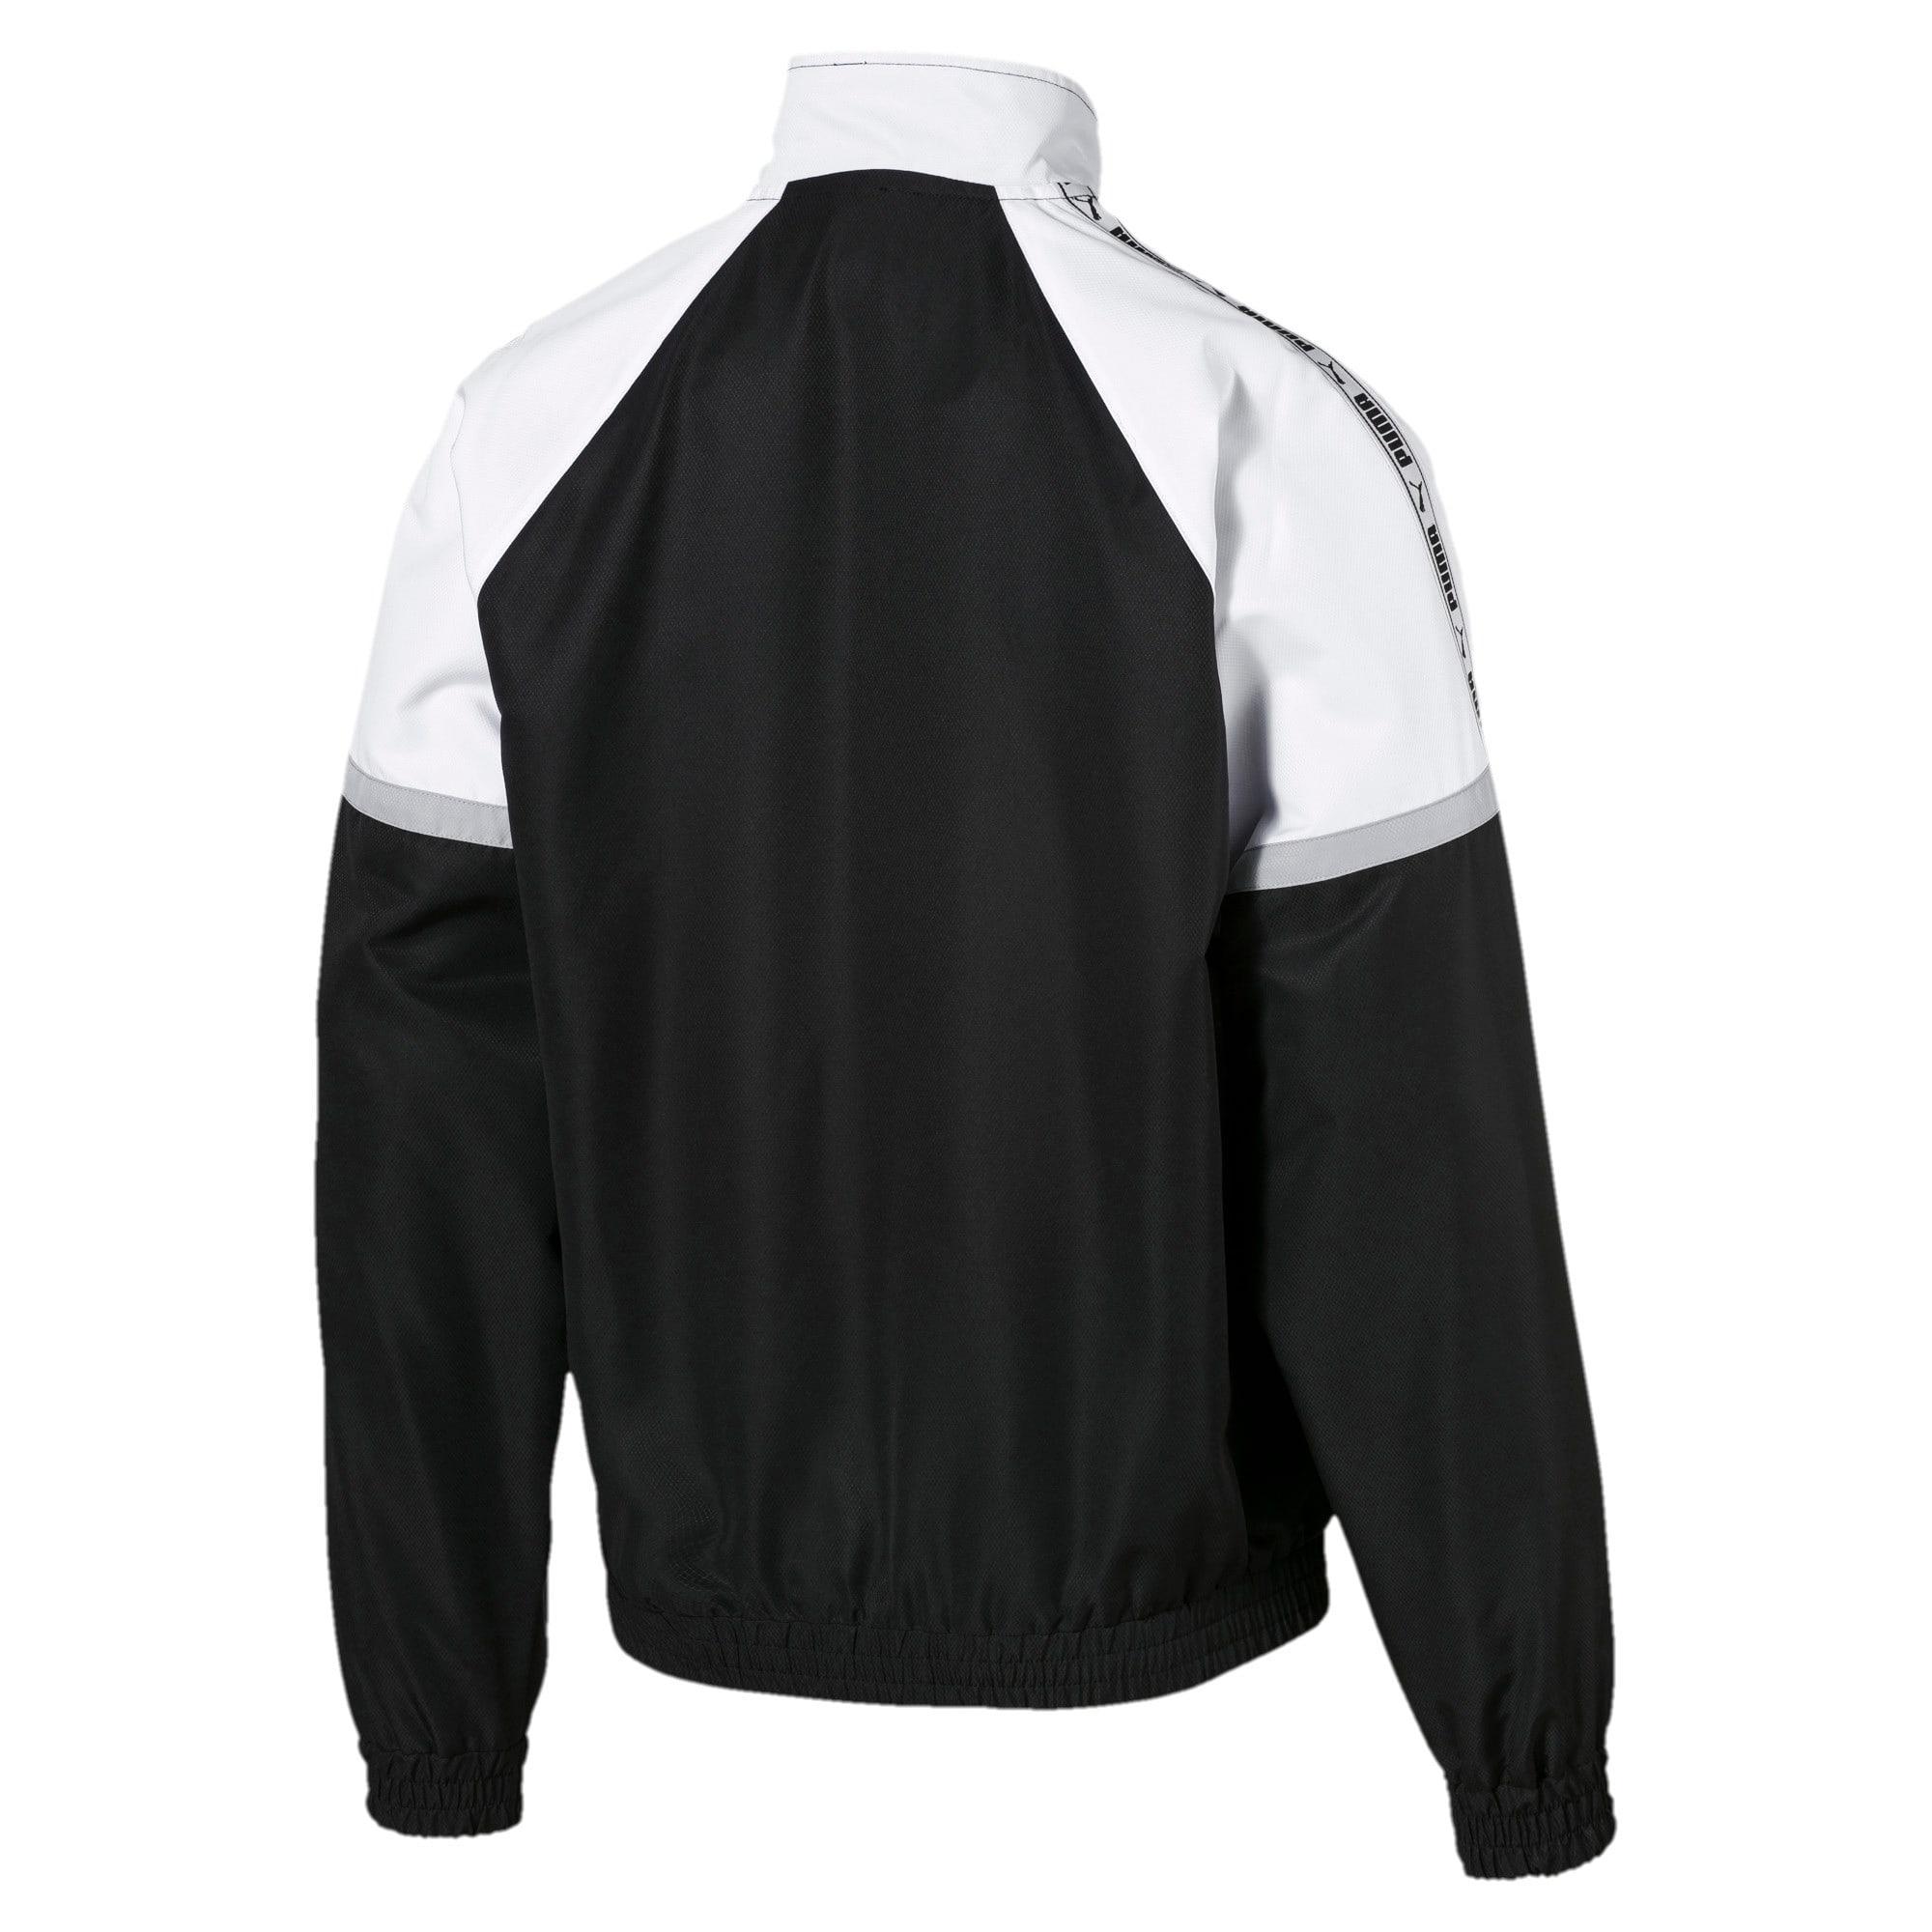 Thumbnail 6 of PUMA XTG Full Zip Men's Woven Jacket, Puma Black-Puma white, medium